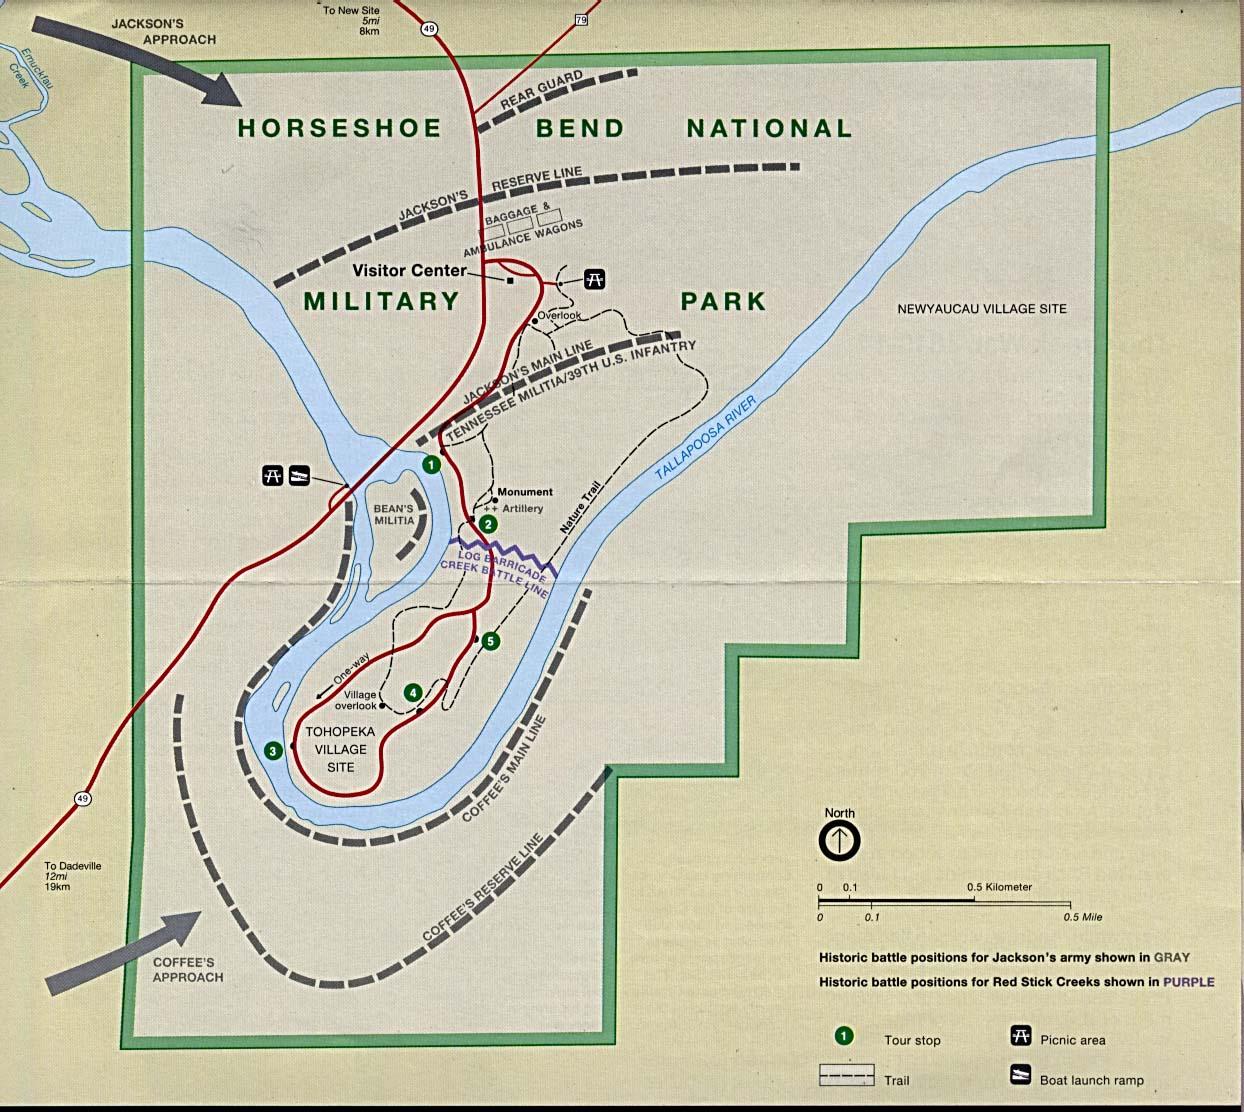 Horseshoe_bend_map